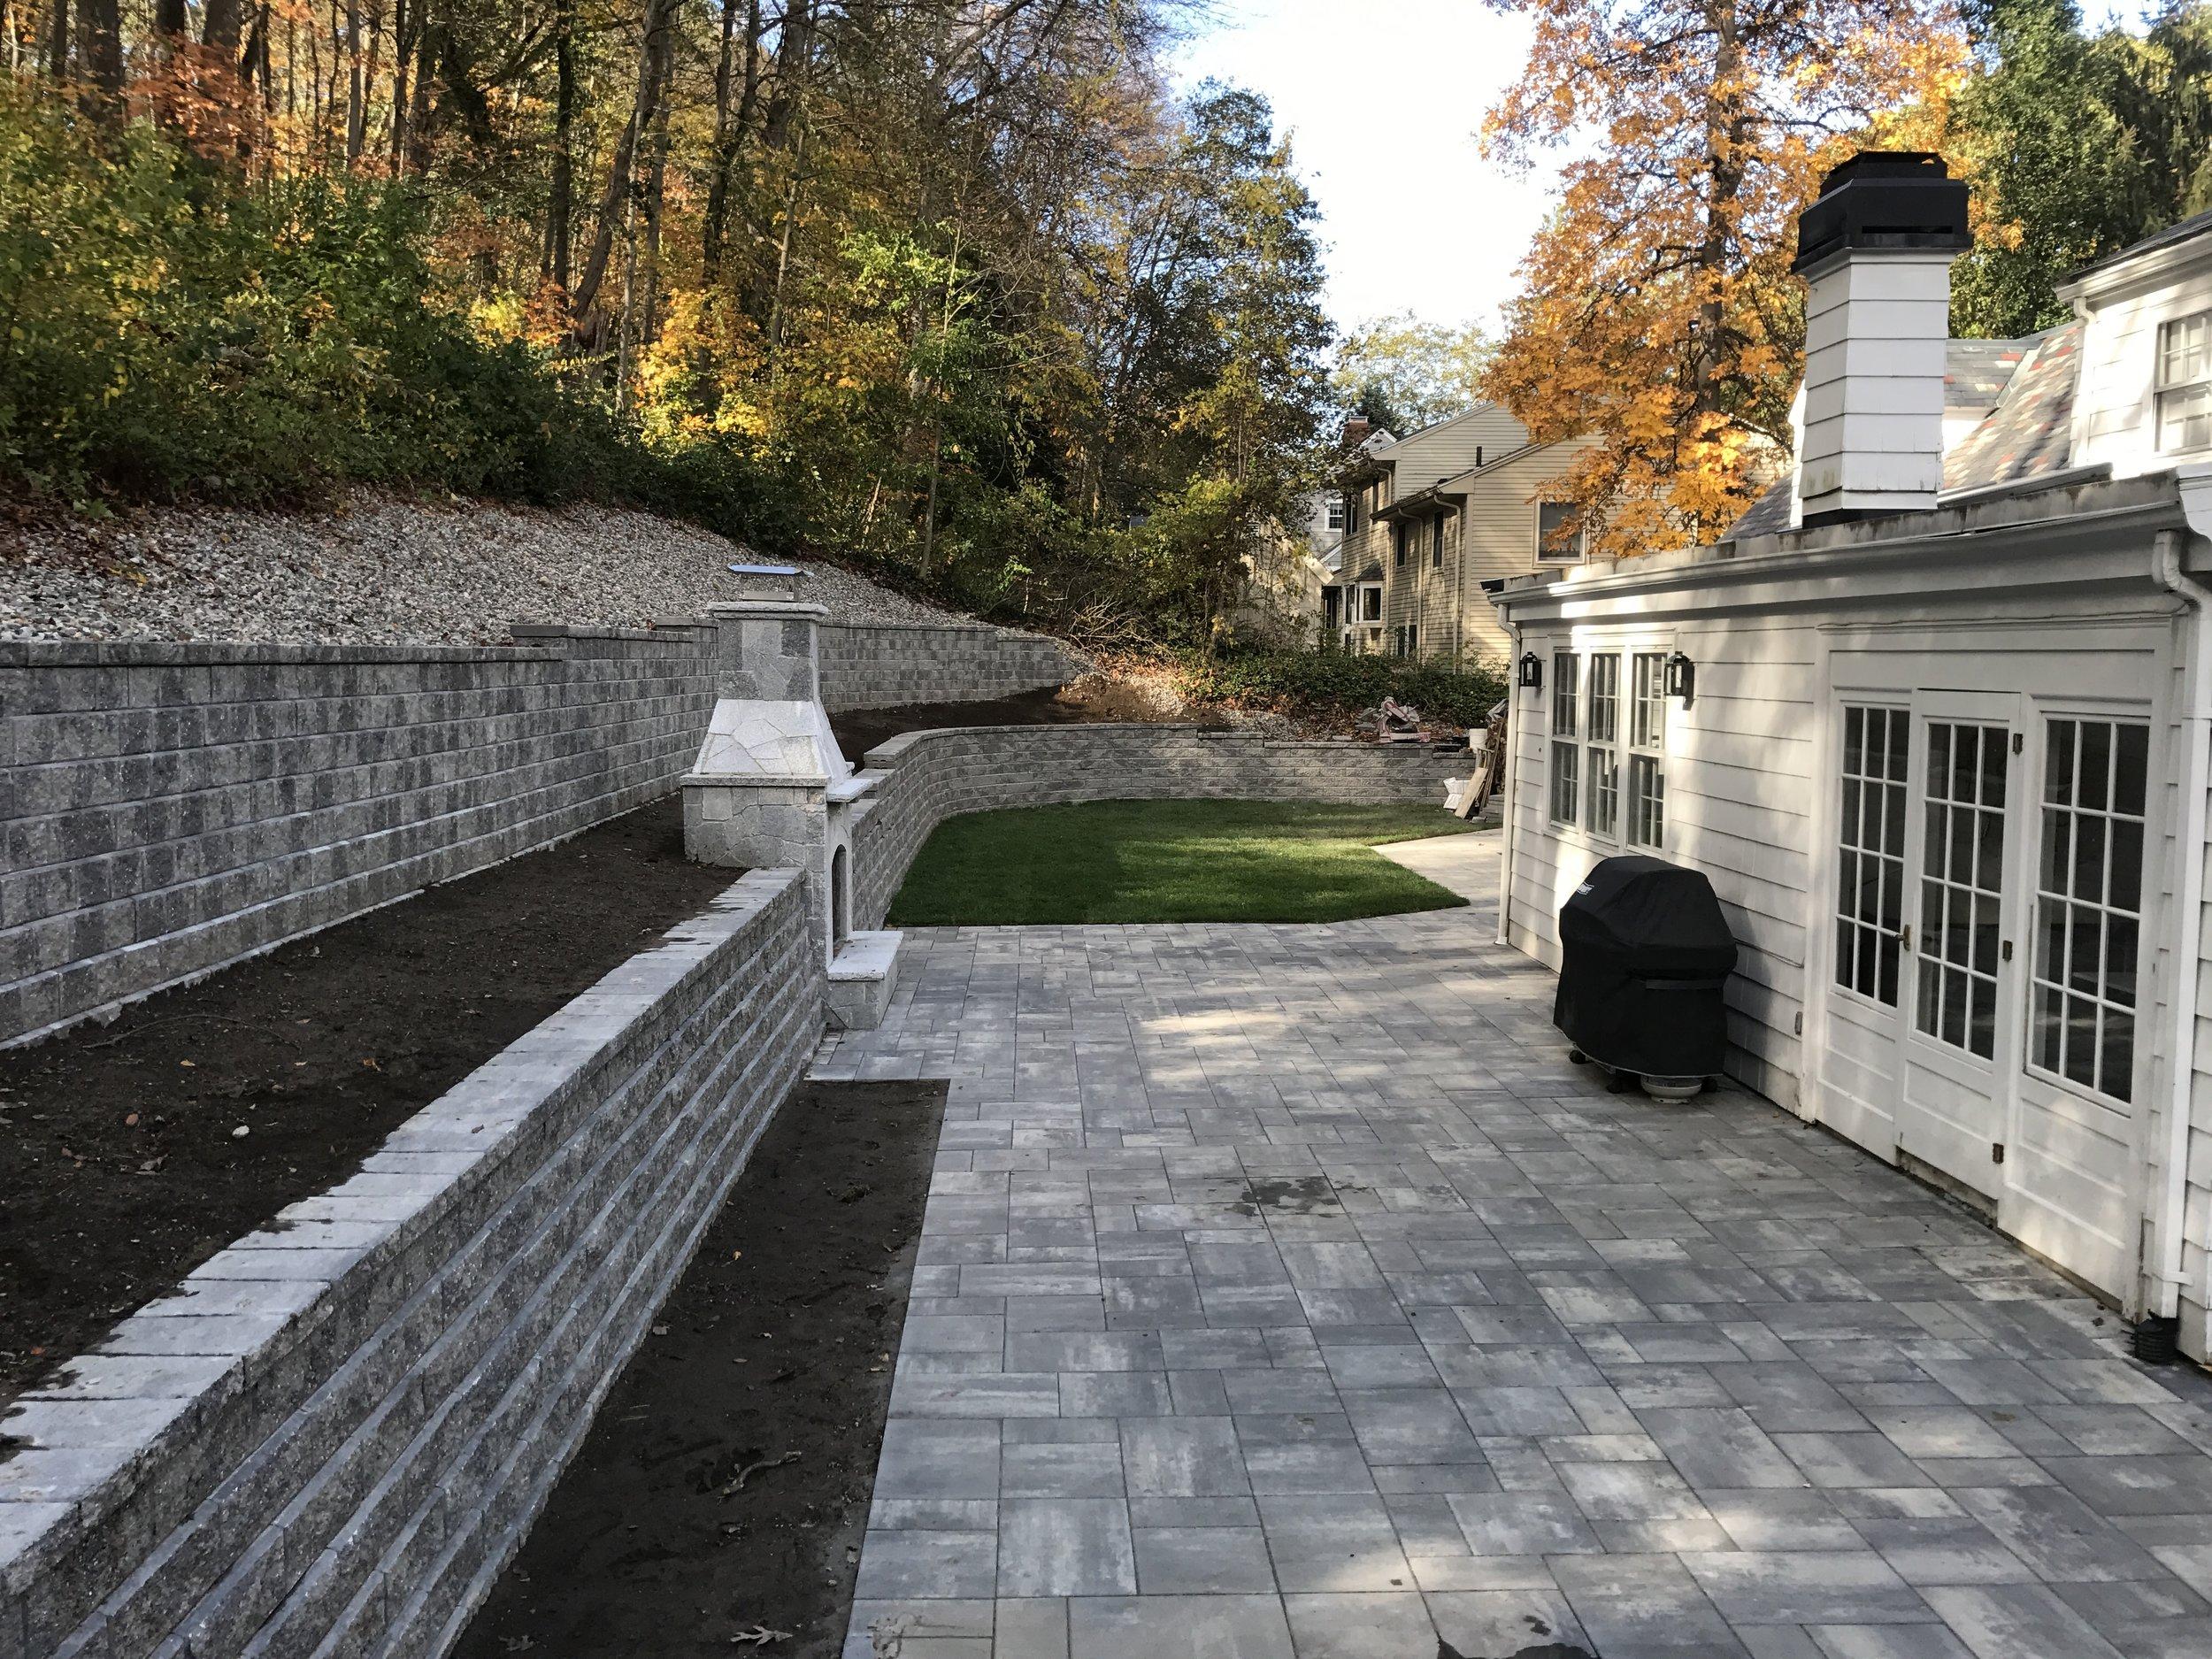 Wenzel landscaping patio installation in Chestnut Hill, Massachusetts